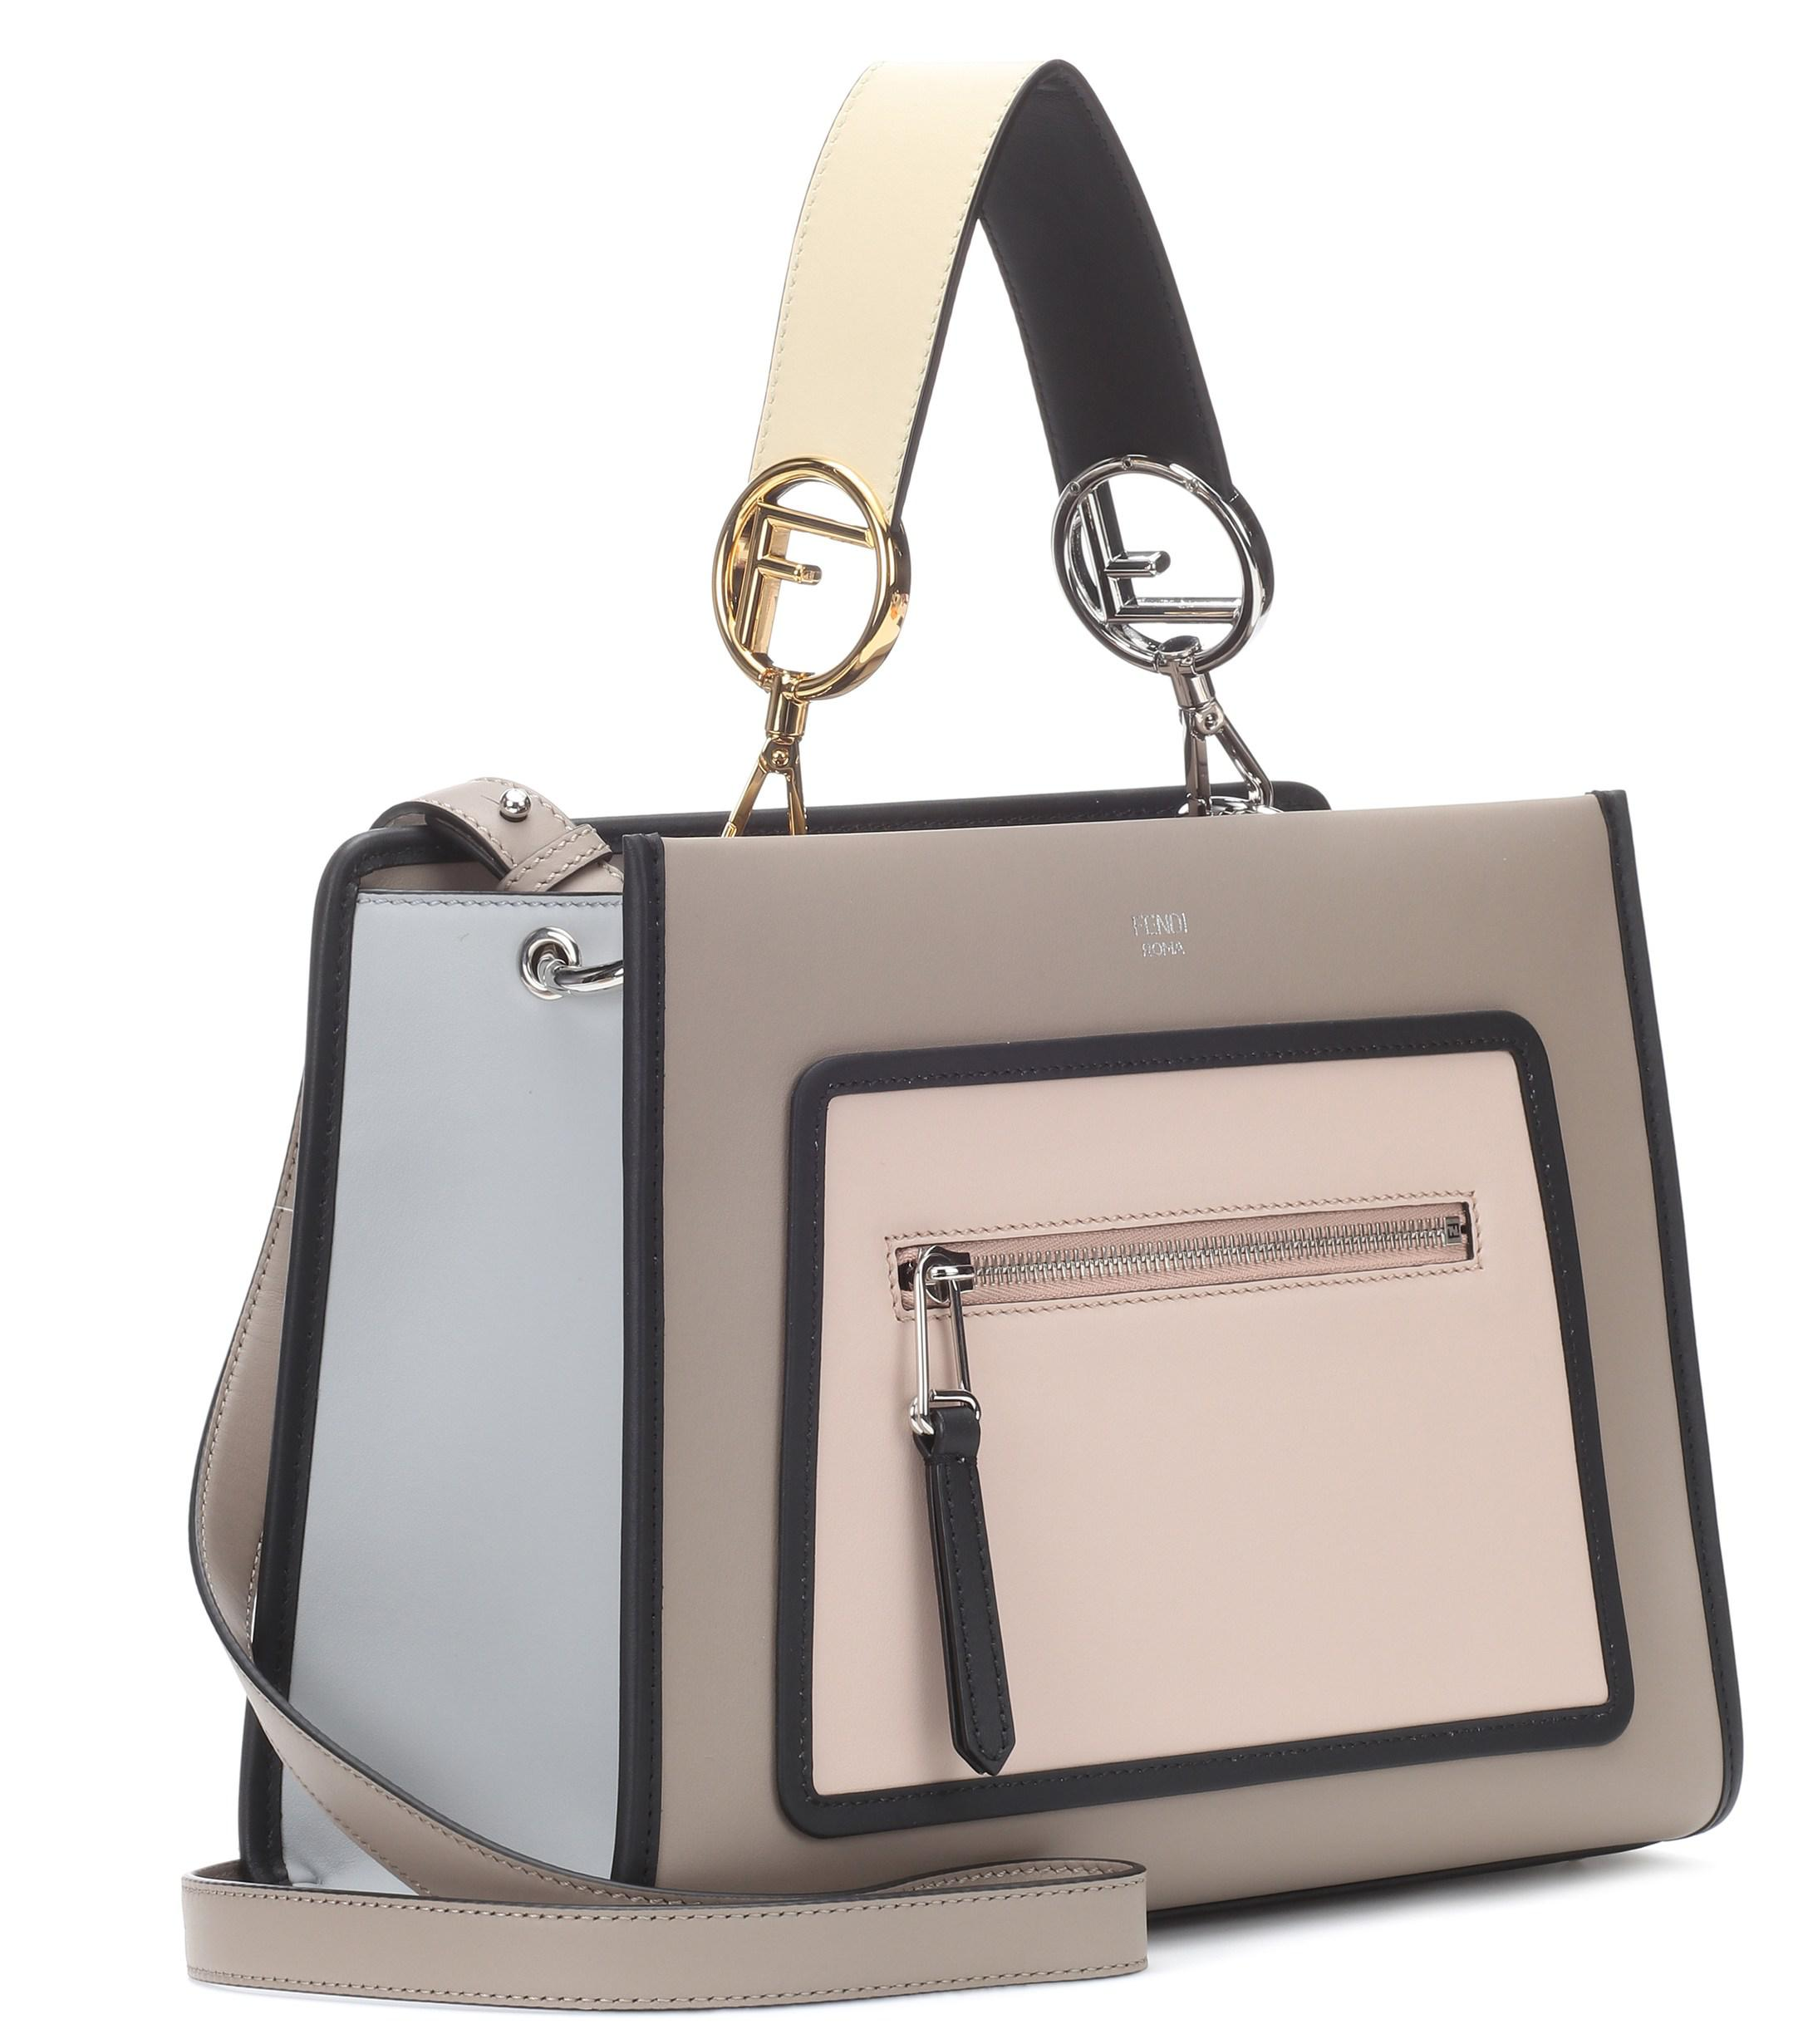 f631c10acbe Fendi Runway Small Leather Shoulder Bag - Lyst